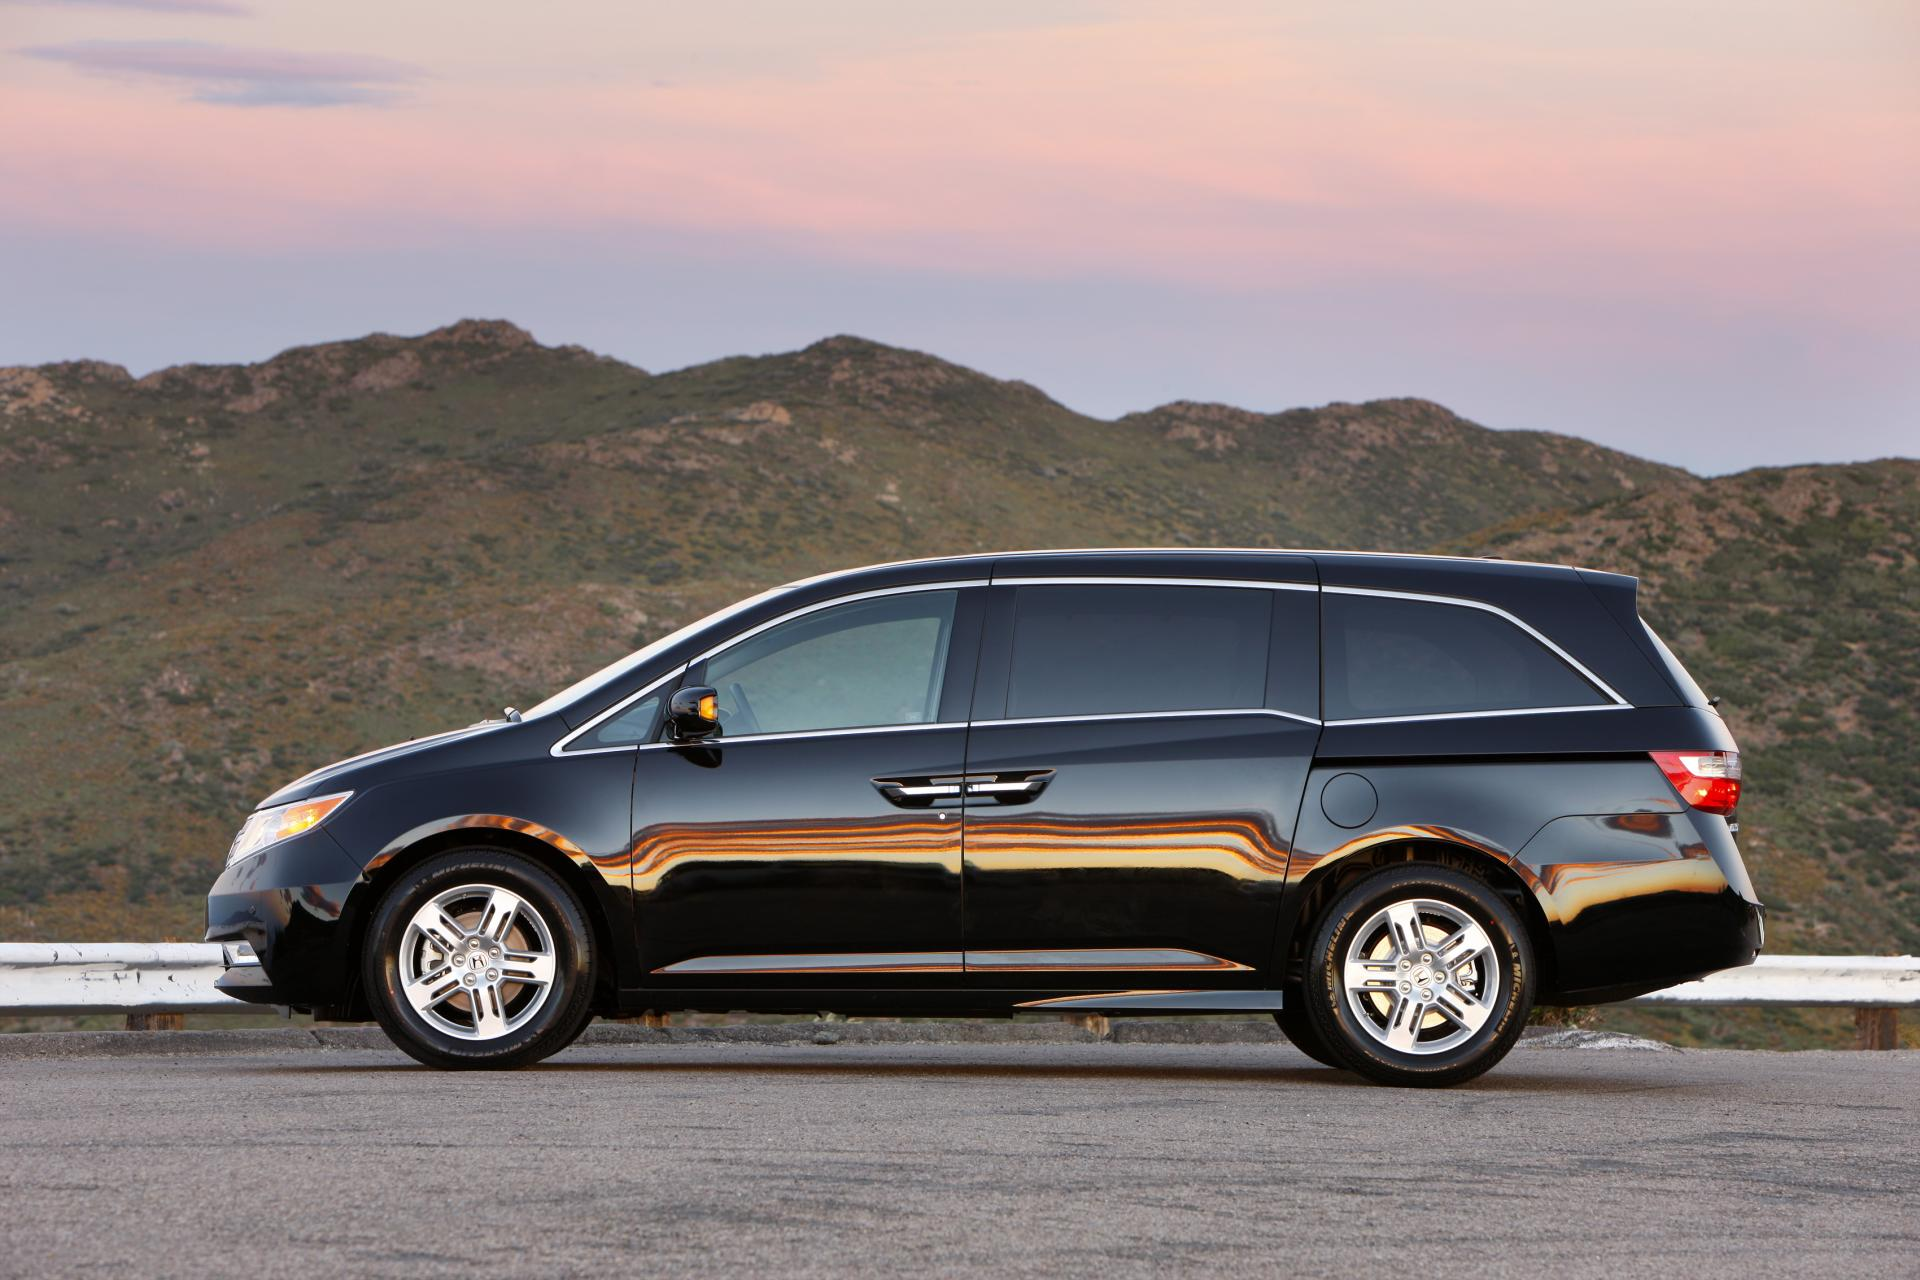 2012 honda odyssey technical specifications and data for Honda odyssey minivan